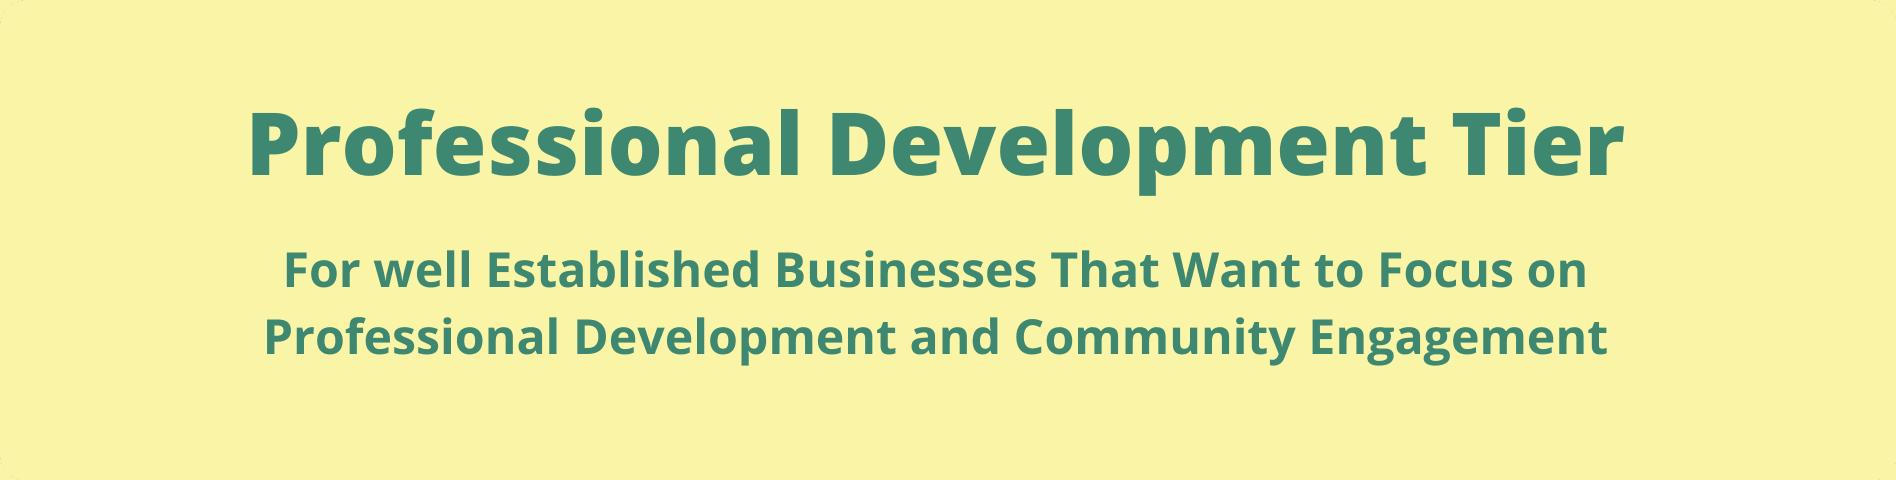 Professional-Development-Tier-w1896.png